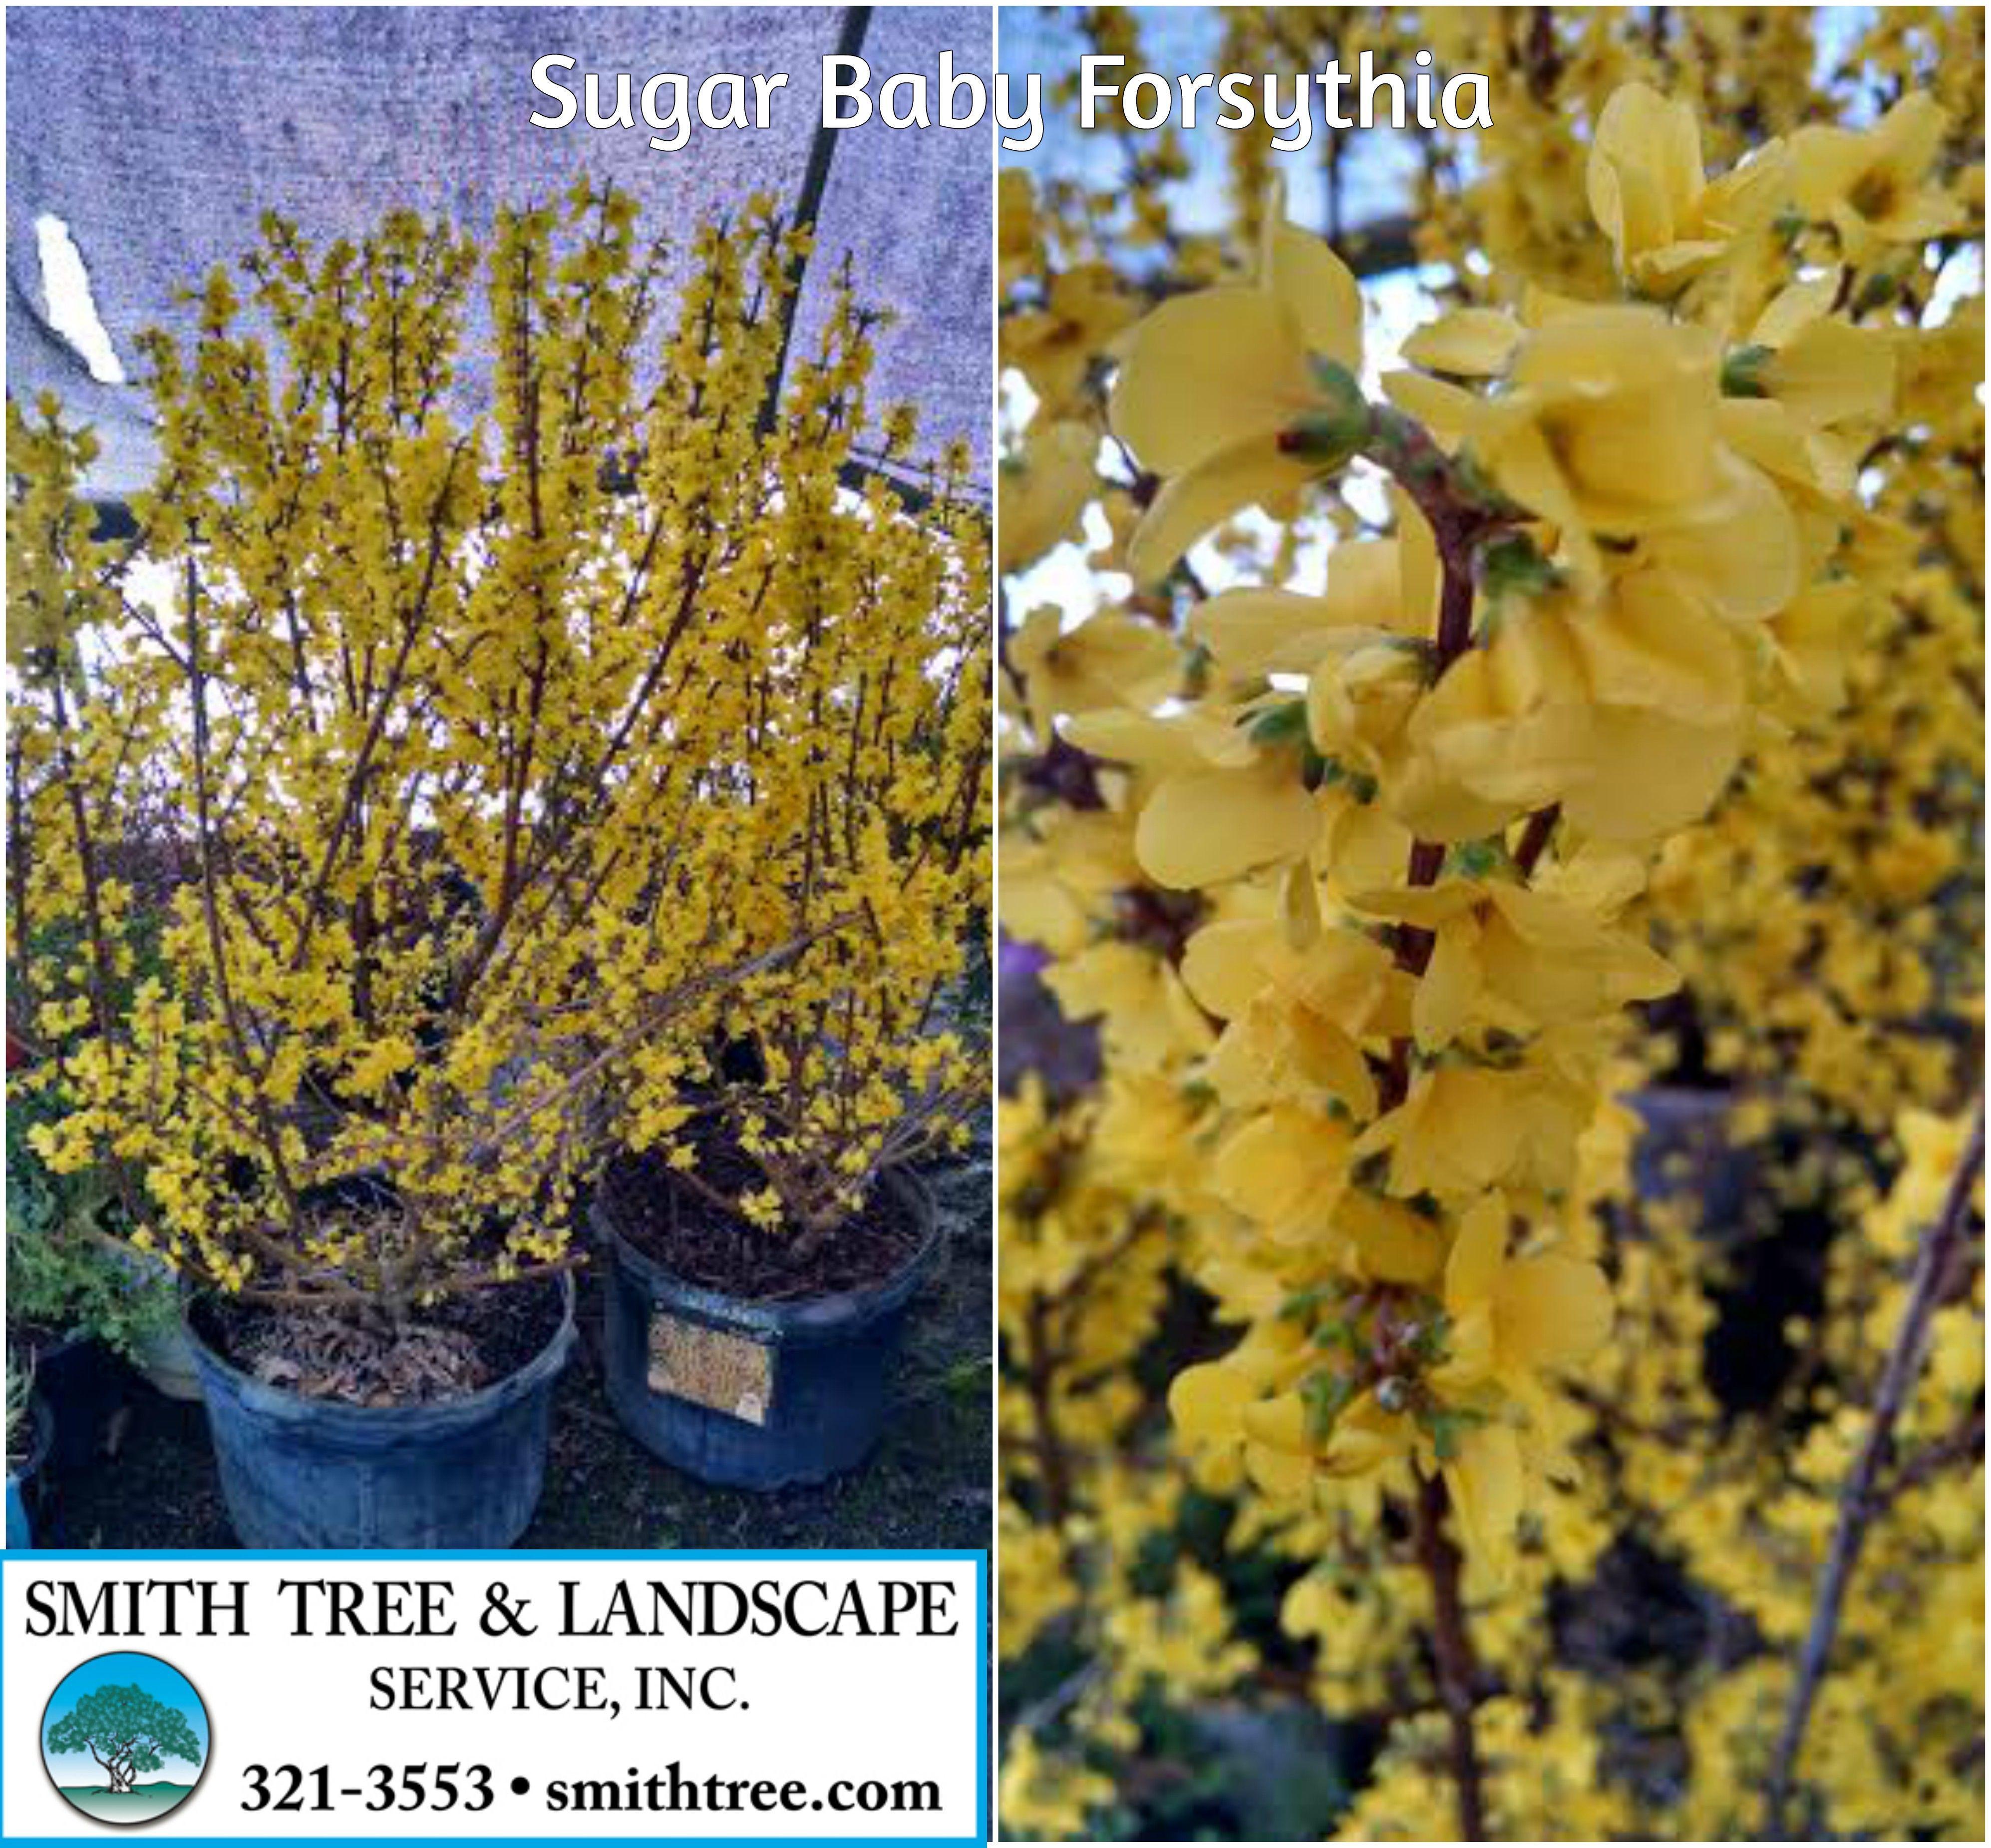 vase shaped trees of forsythia show off sugar baby sugar baby forsythia 3 4 with intended for forsythia show off sugar baby sugar baby forsythia 3 4